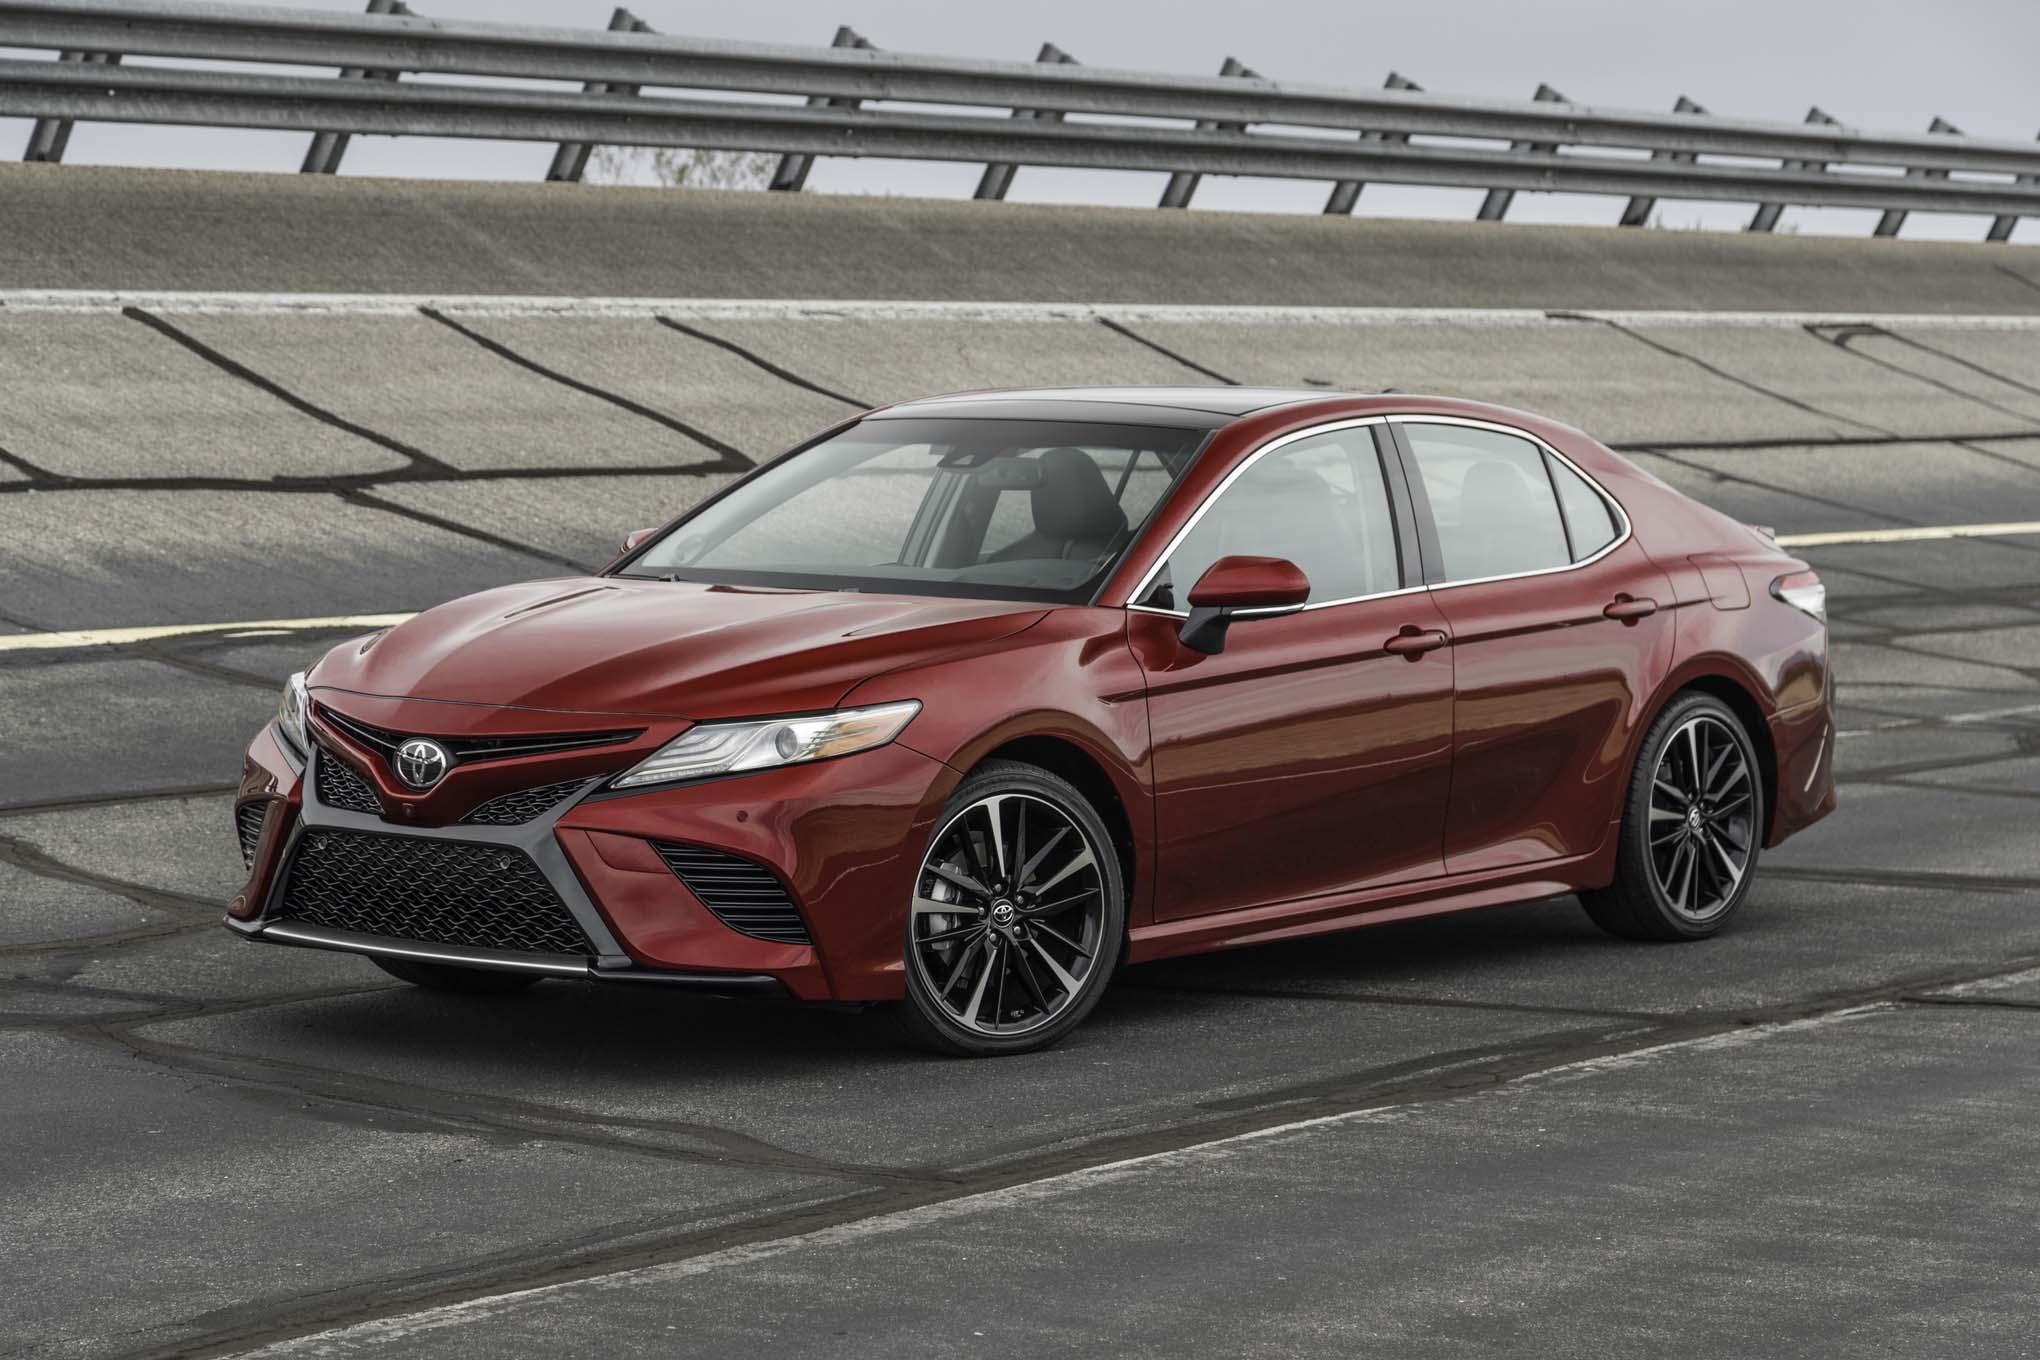 2018 Toyota Camry XSE V 6 Front Three Quarter